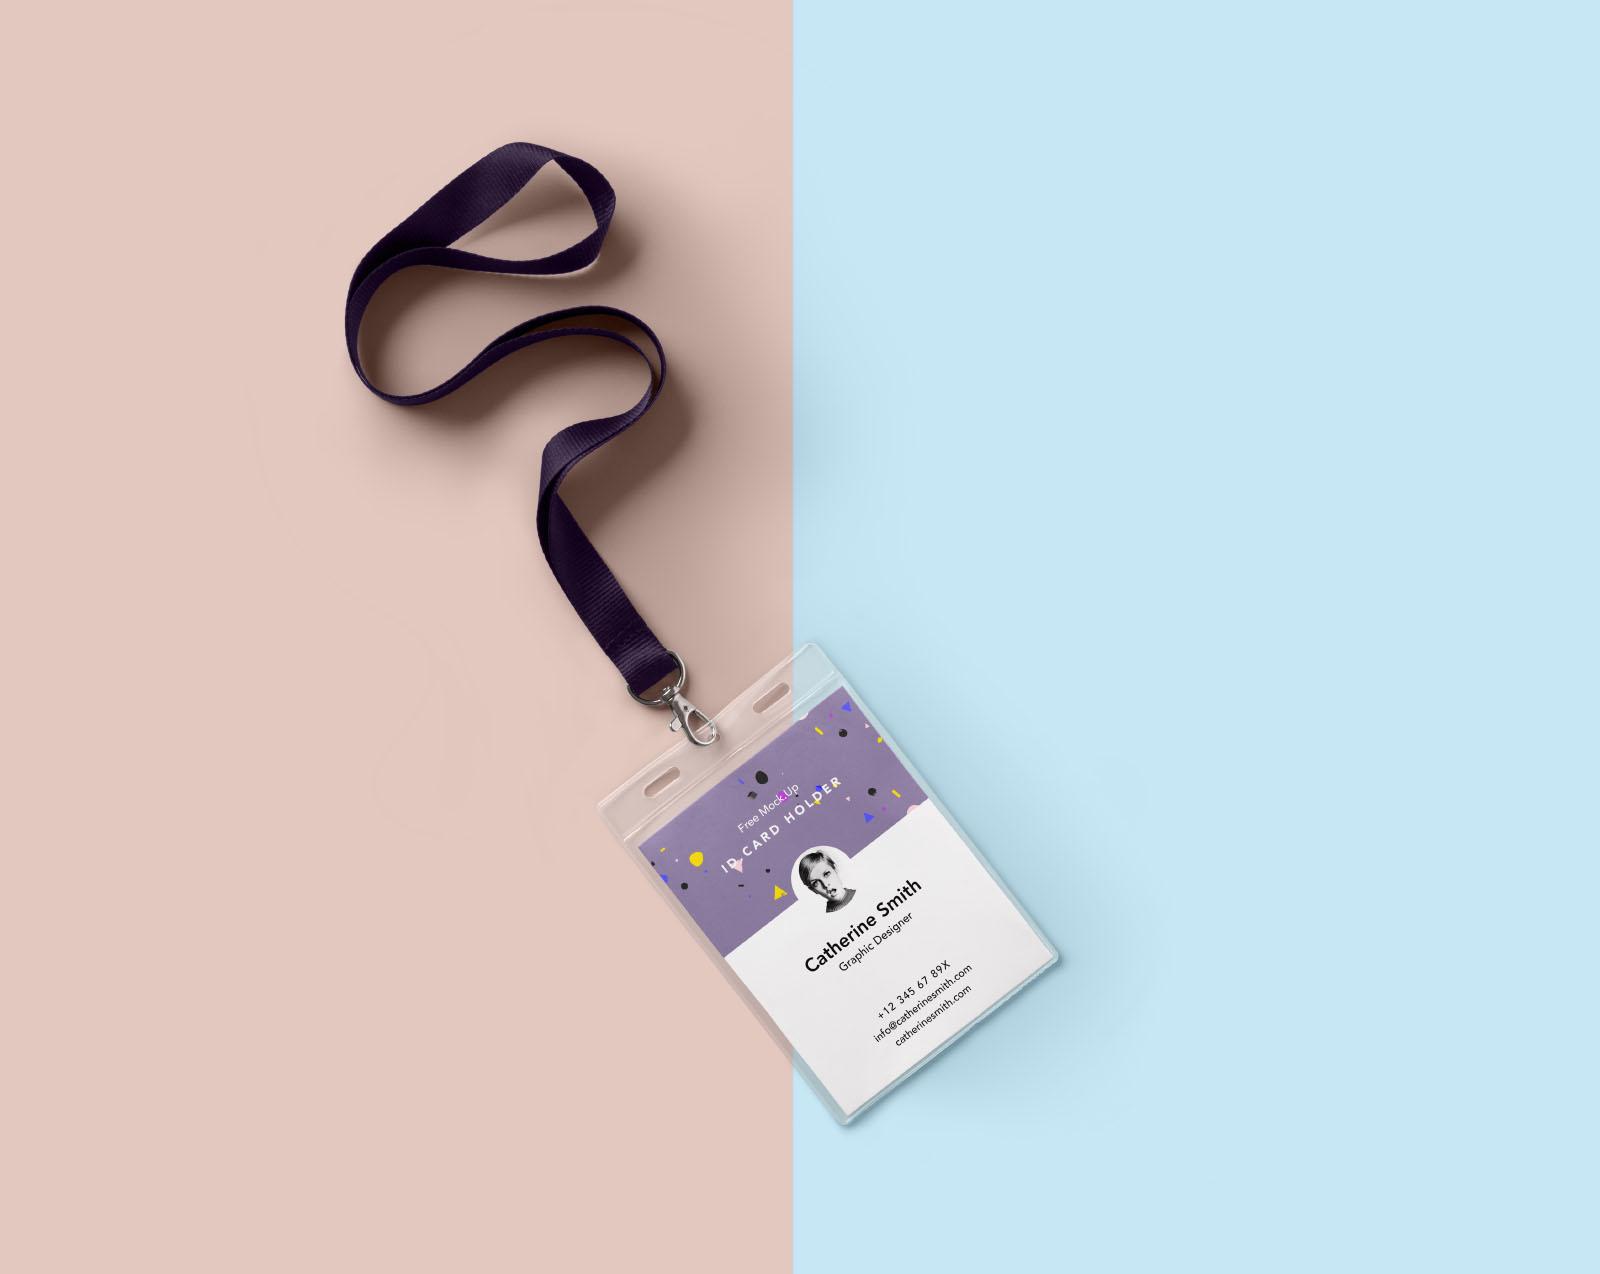 Neck Identity Card Holder Mockup